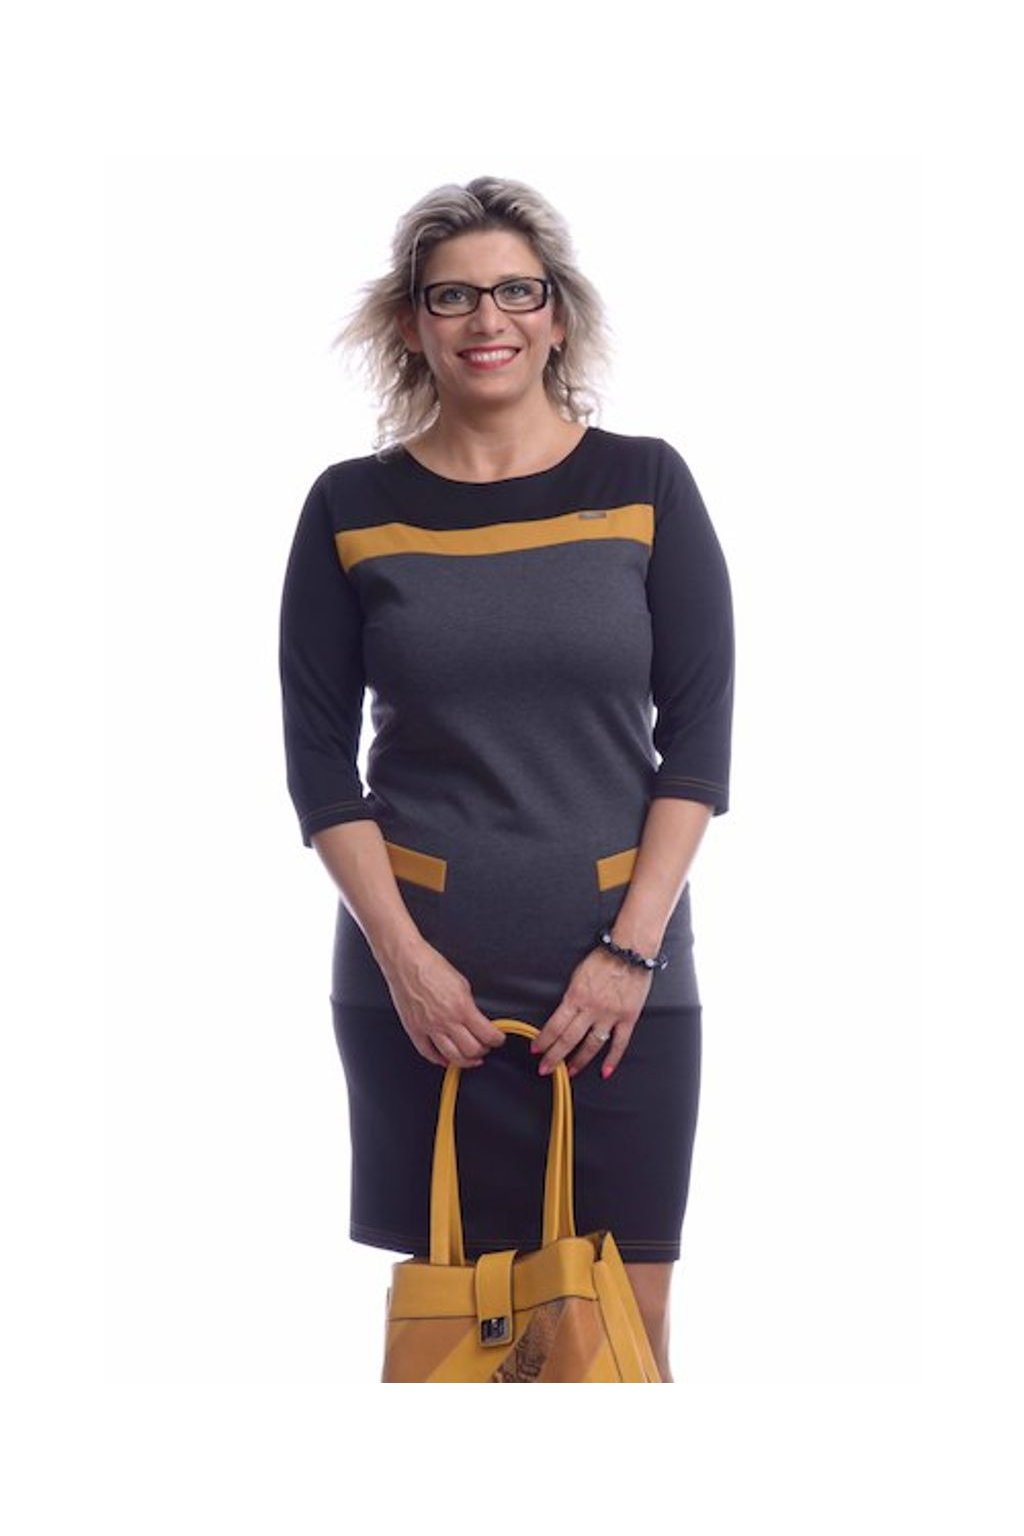 8719 Šaty barevné pásky (Velikost 36, Barva Žlutá)